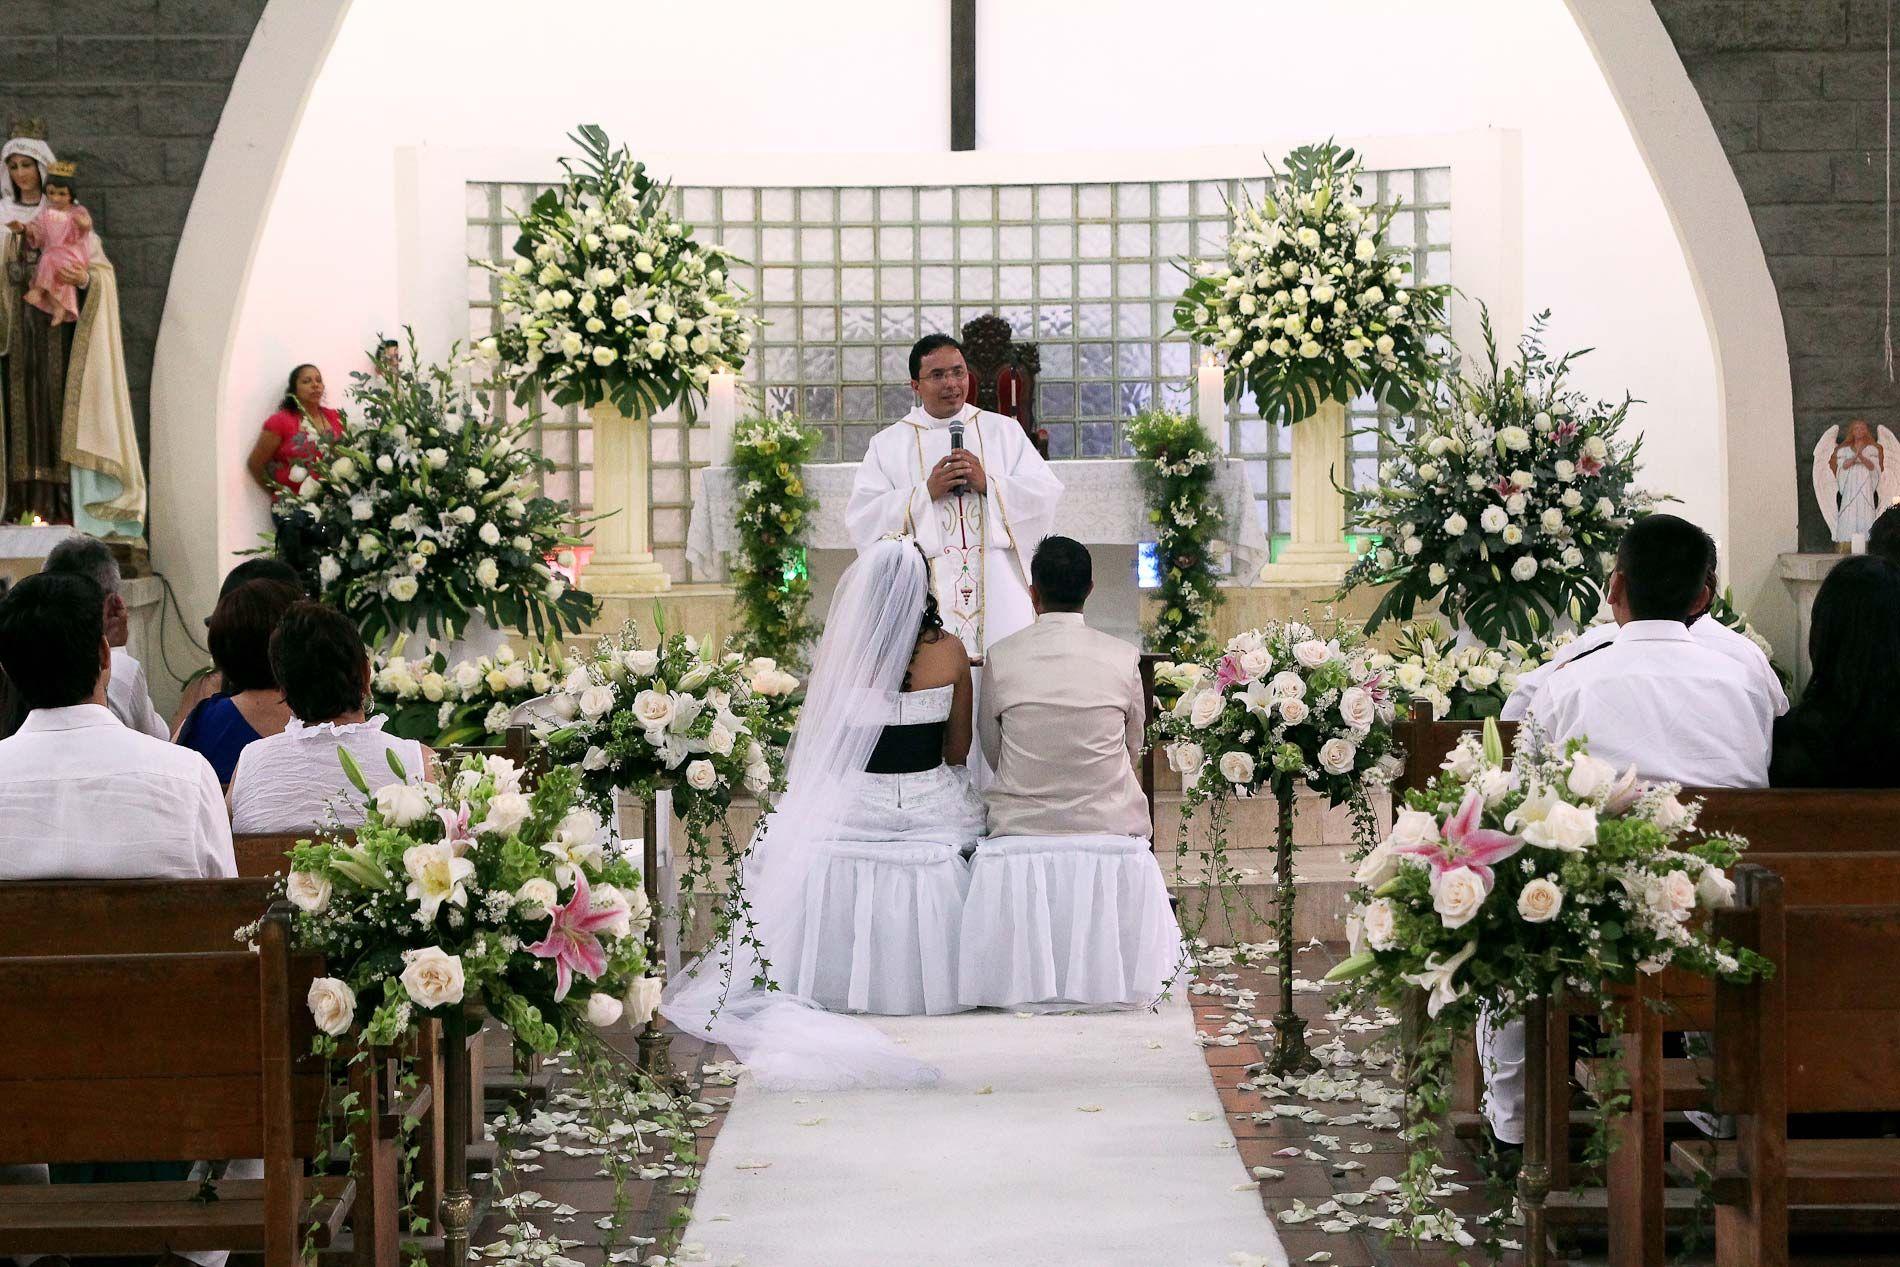 Bodas en cali decoraci n iglesias decoraci n de bodas - Decoracion bodas baratas ...